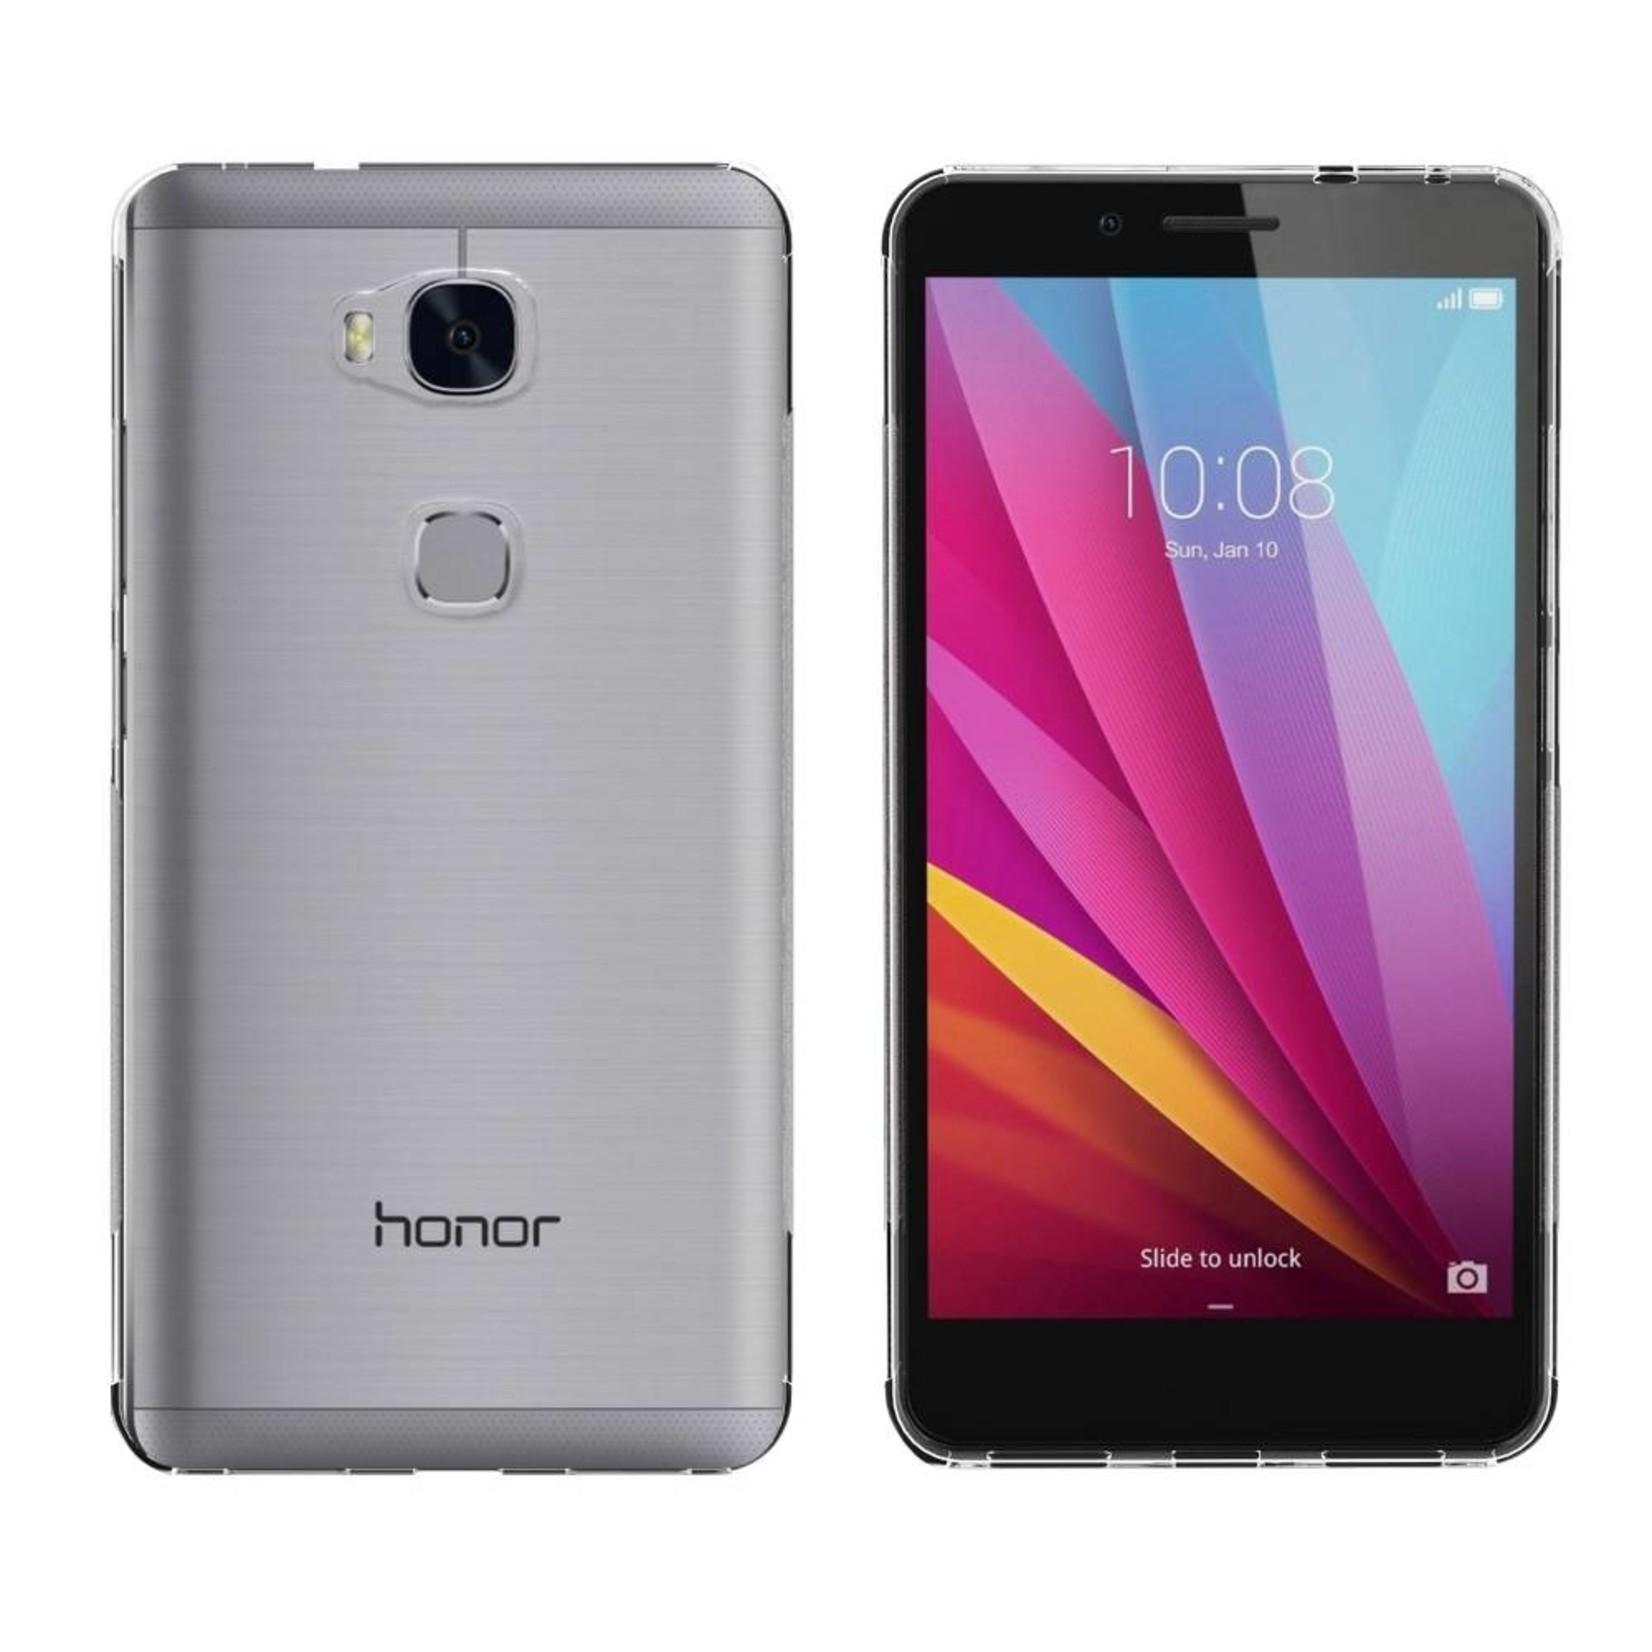 Colorfone Hoesje CoolSkin3T voor Huawei Honor 5X Tr. Wit